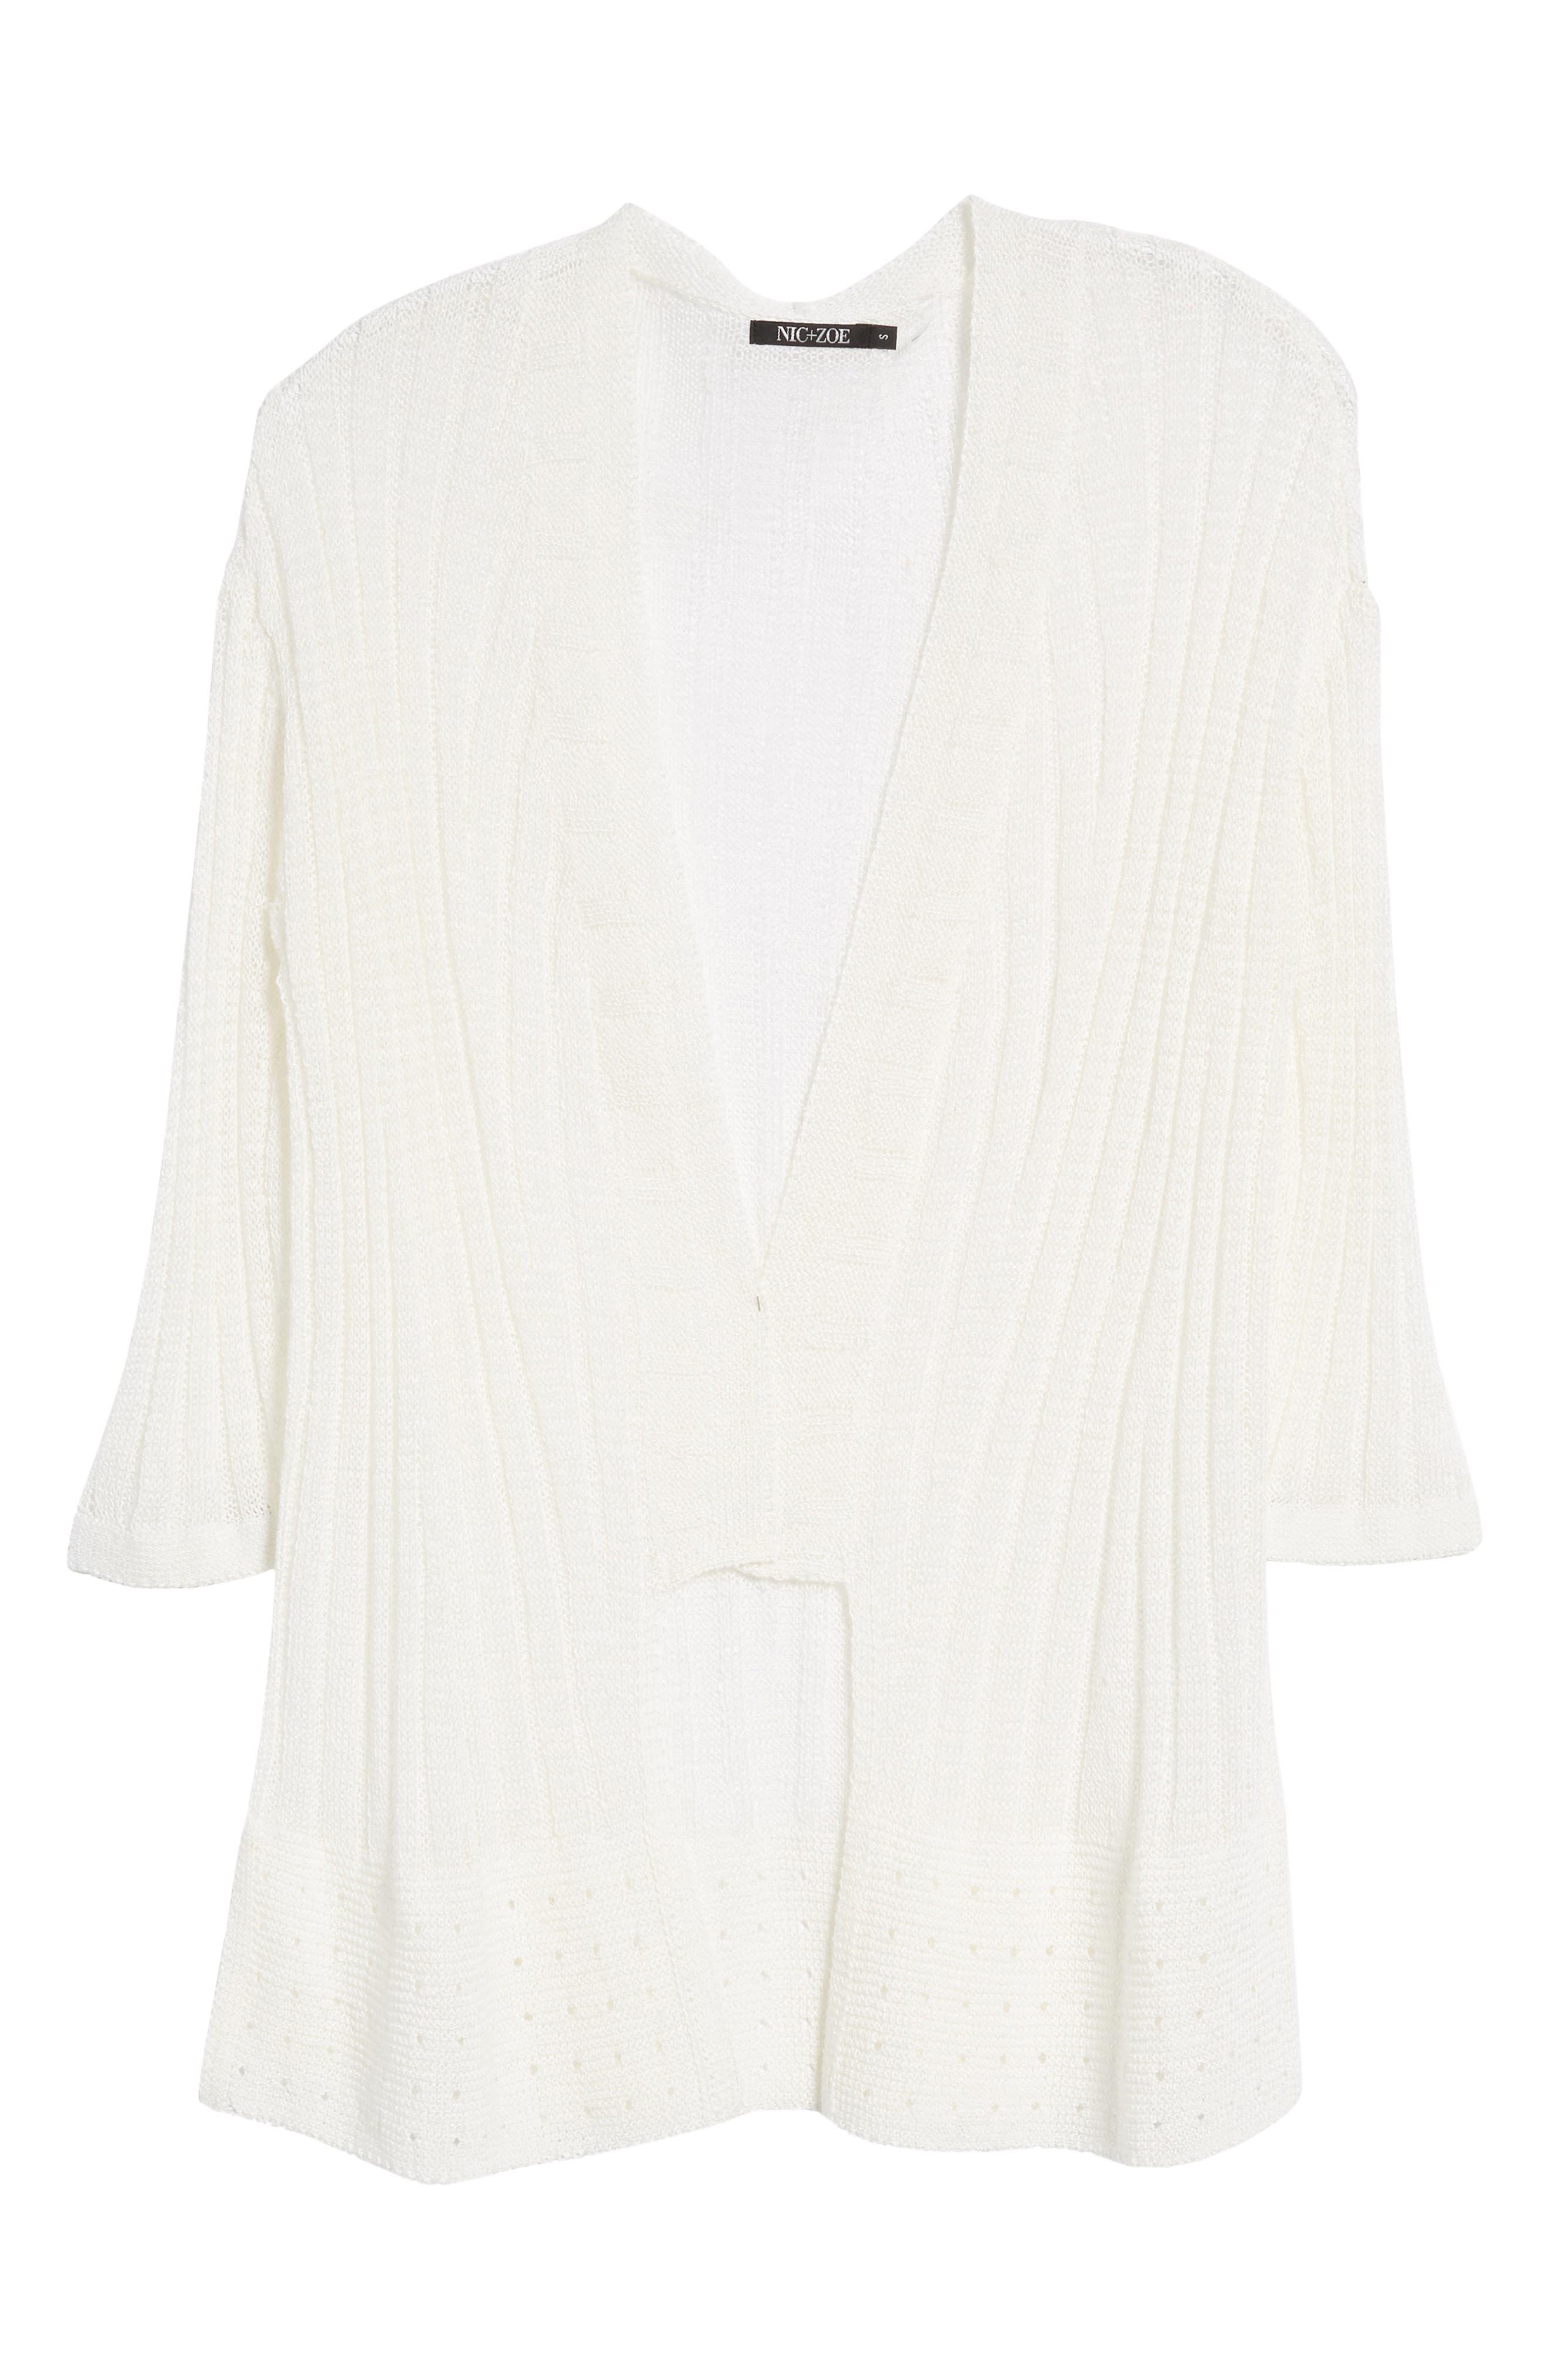 Changing Tides Linen Blend Open Front Cardigan,                             Alternate thumbnail 7, color,                             Milk White